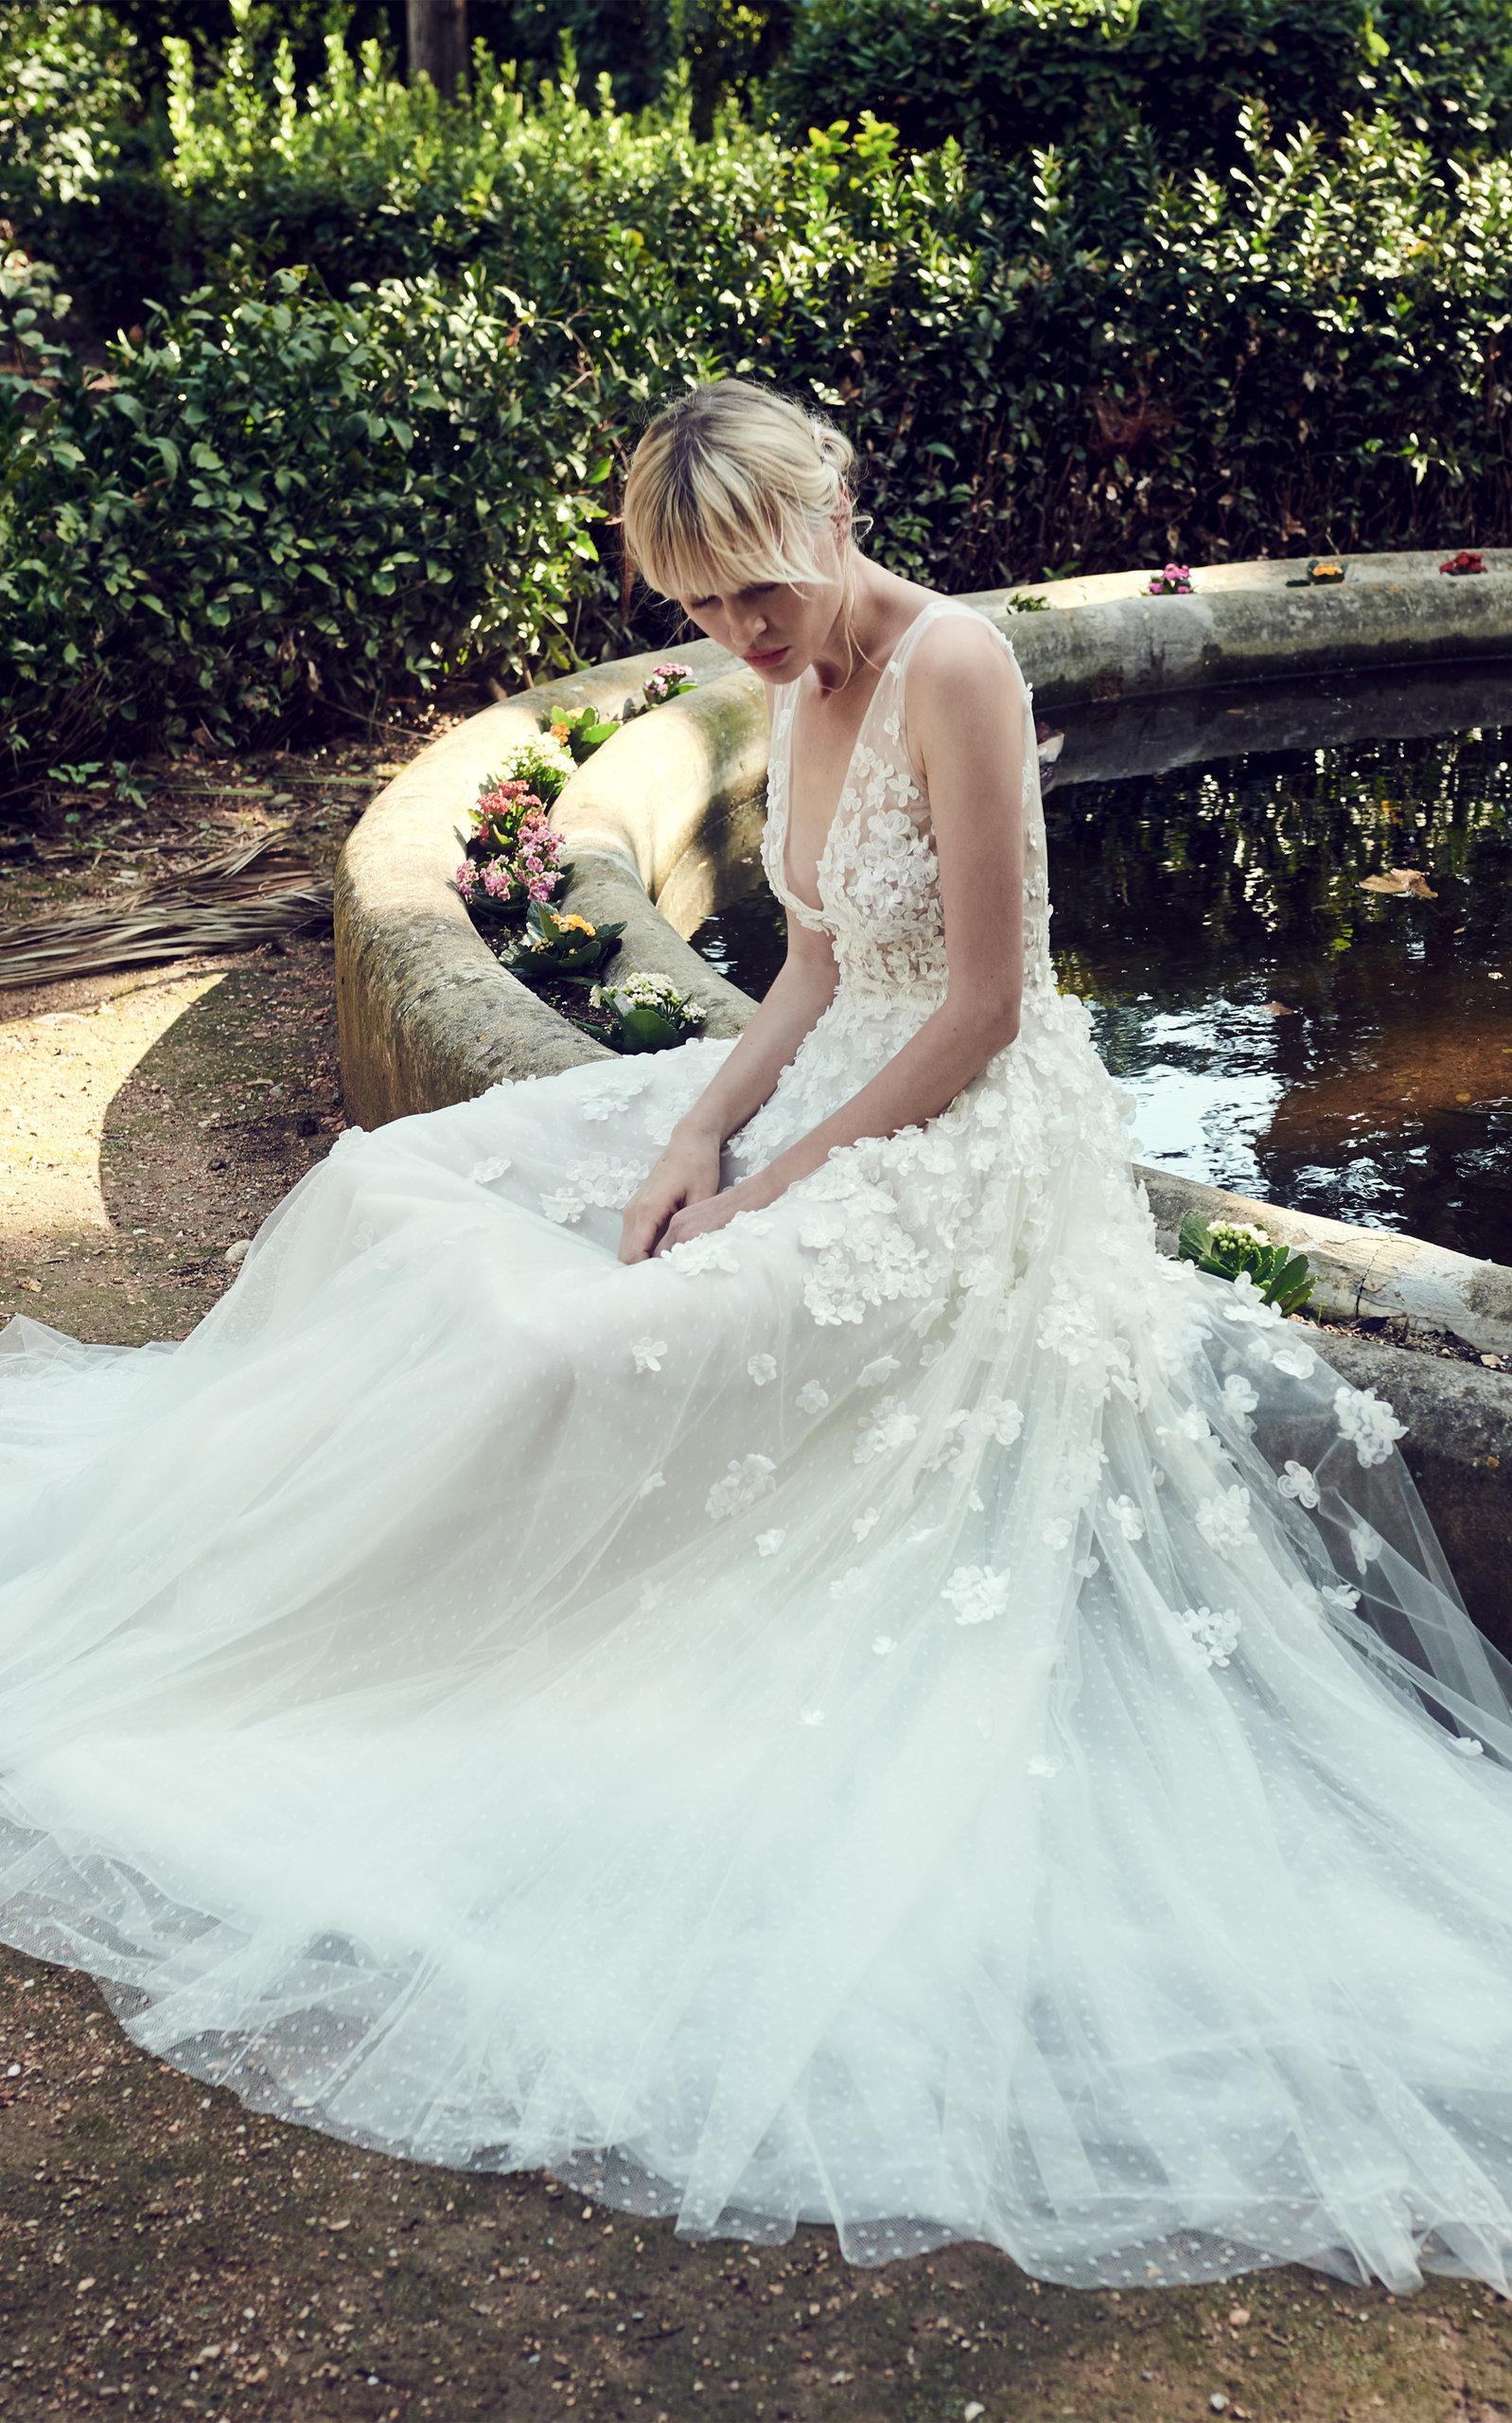 COSTARELLOS BRIDAL Sleeveless V Neck Romantic Gown in White